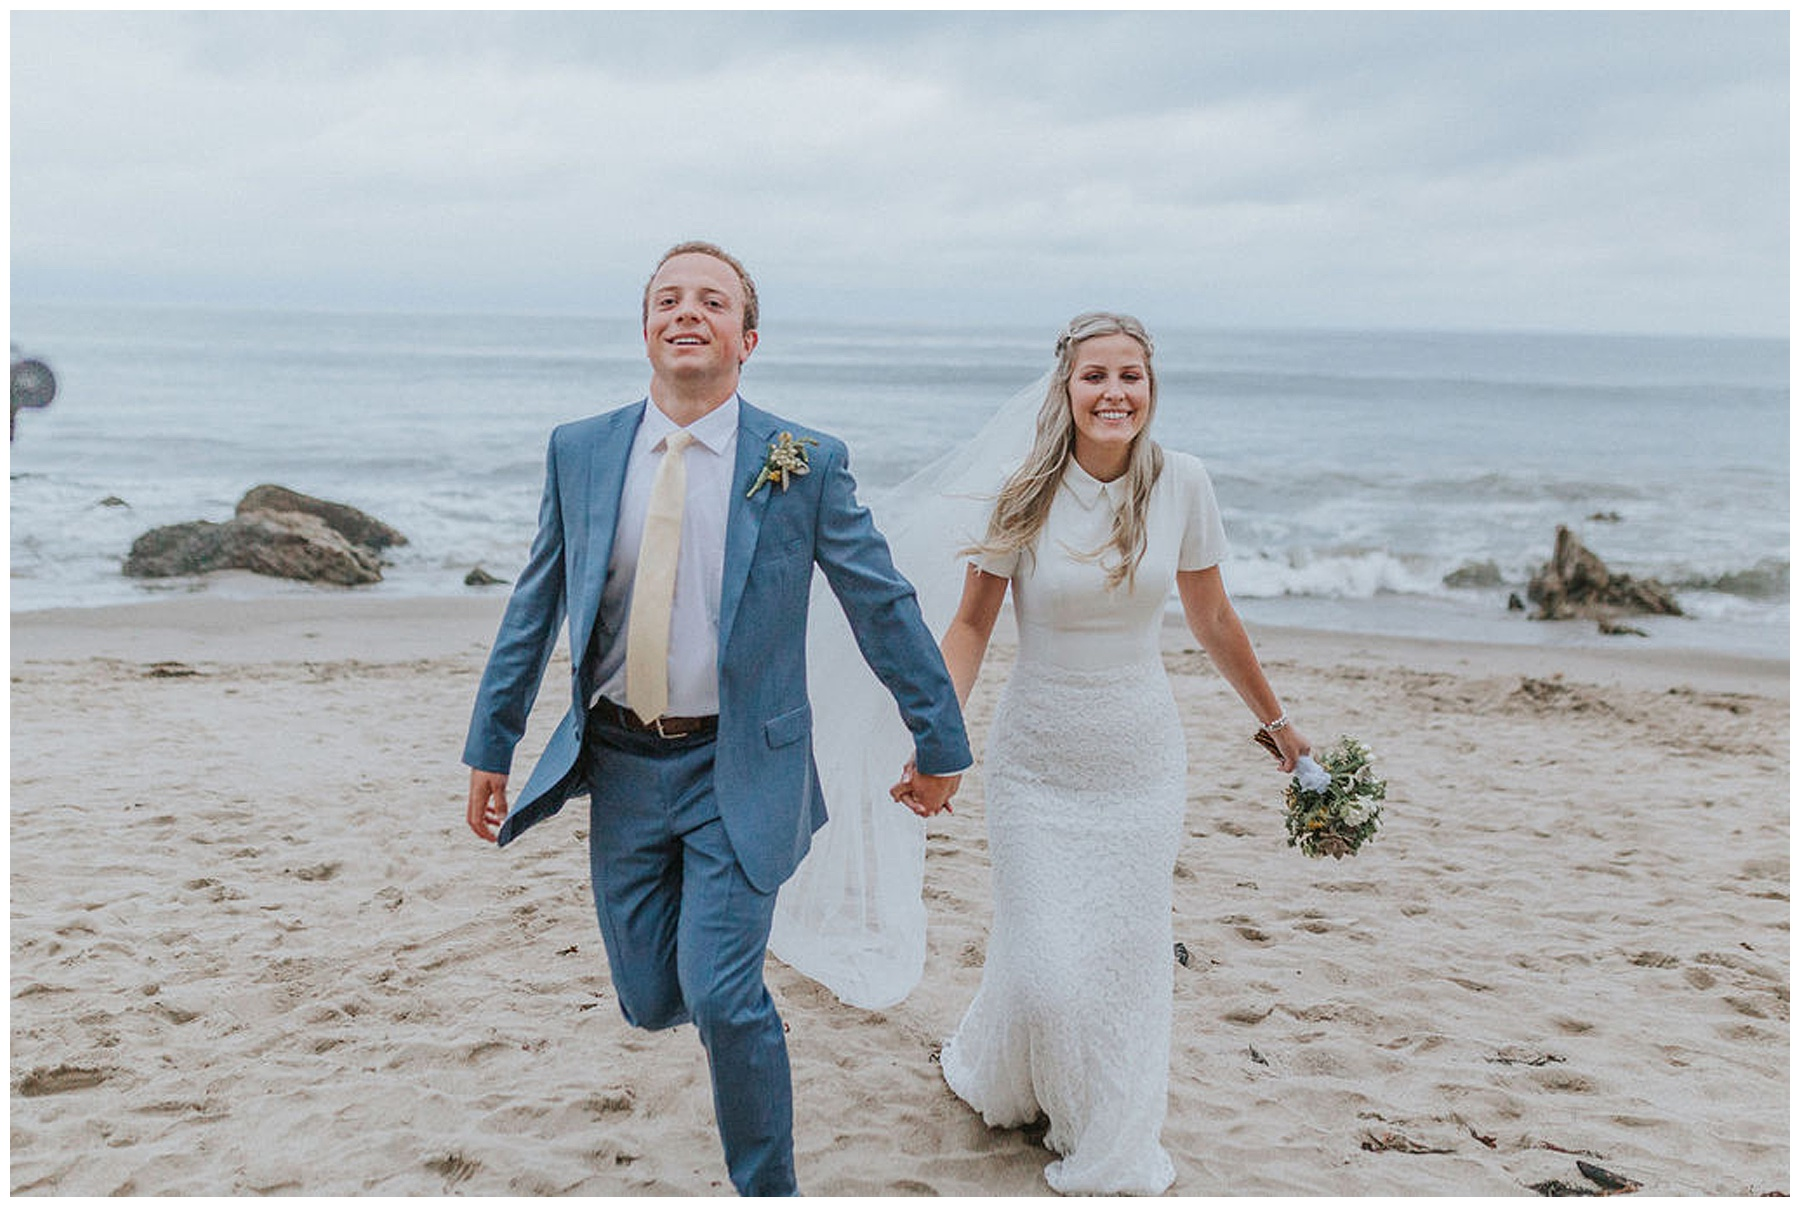 boho-beach-bridals-el-matador-state-beach-los-angeles-look-for-the-light-photo-video